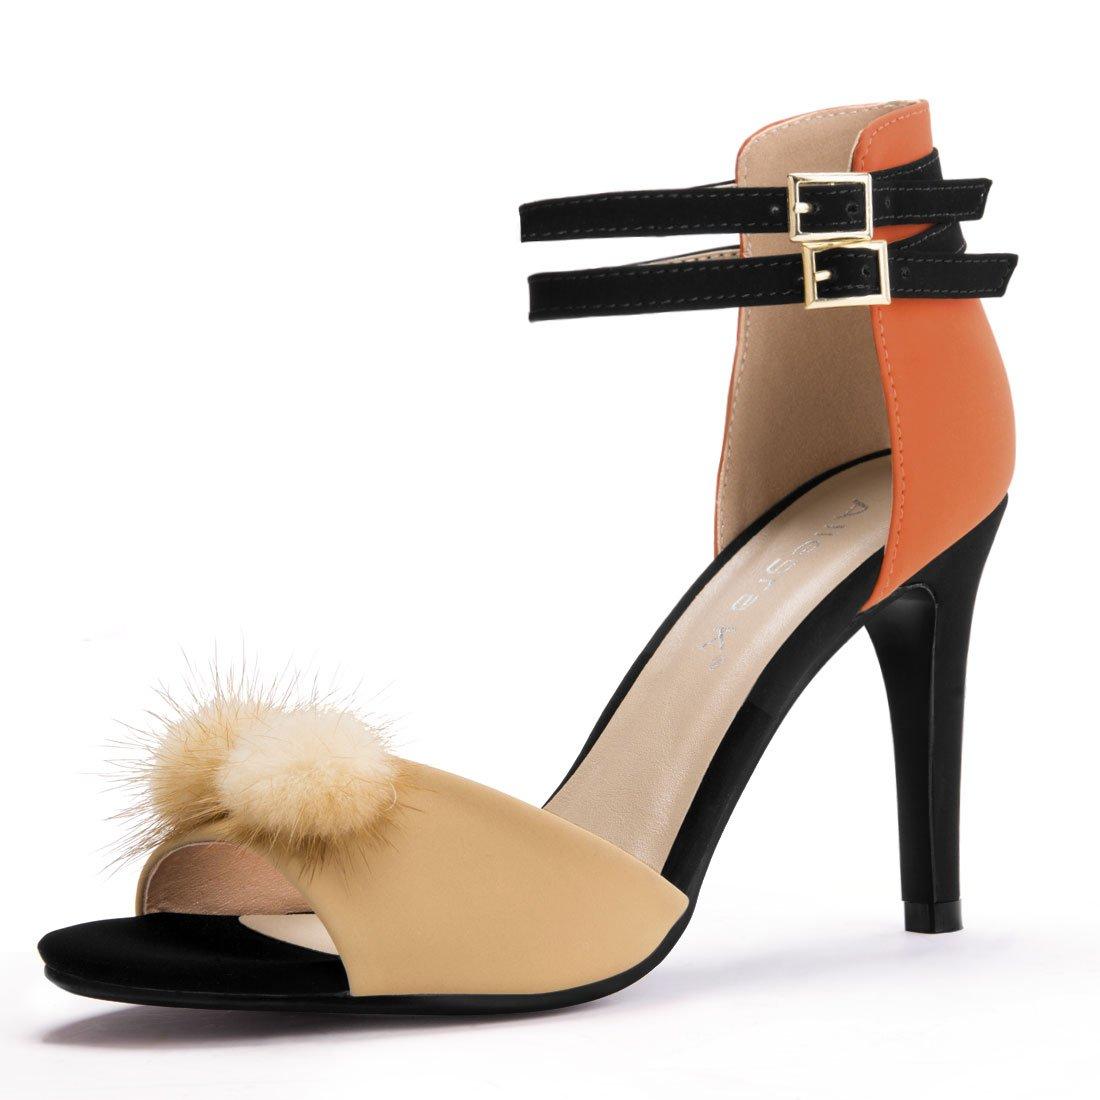 K Heels Sandals Color Block Allegra Women's Decor Pom rdhtsQxC